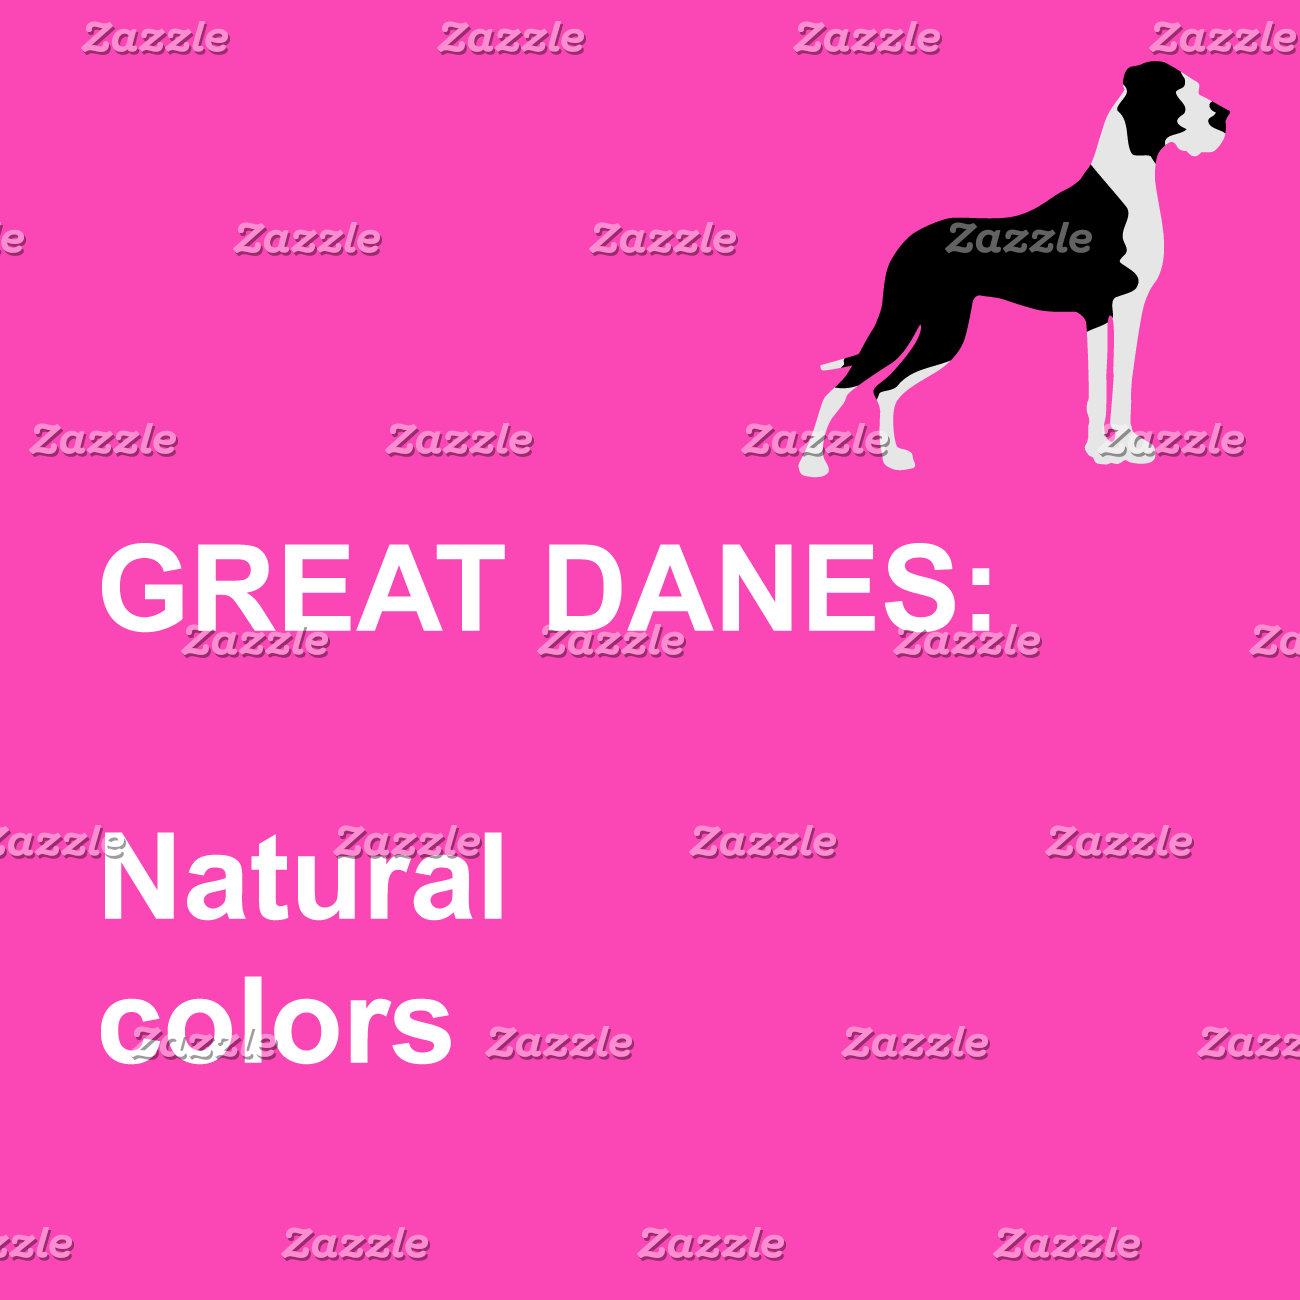 GD natural colors